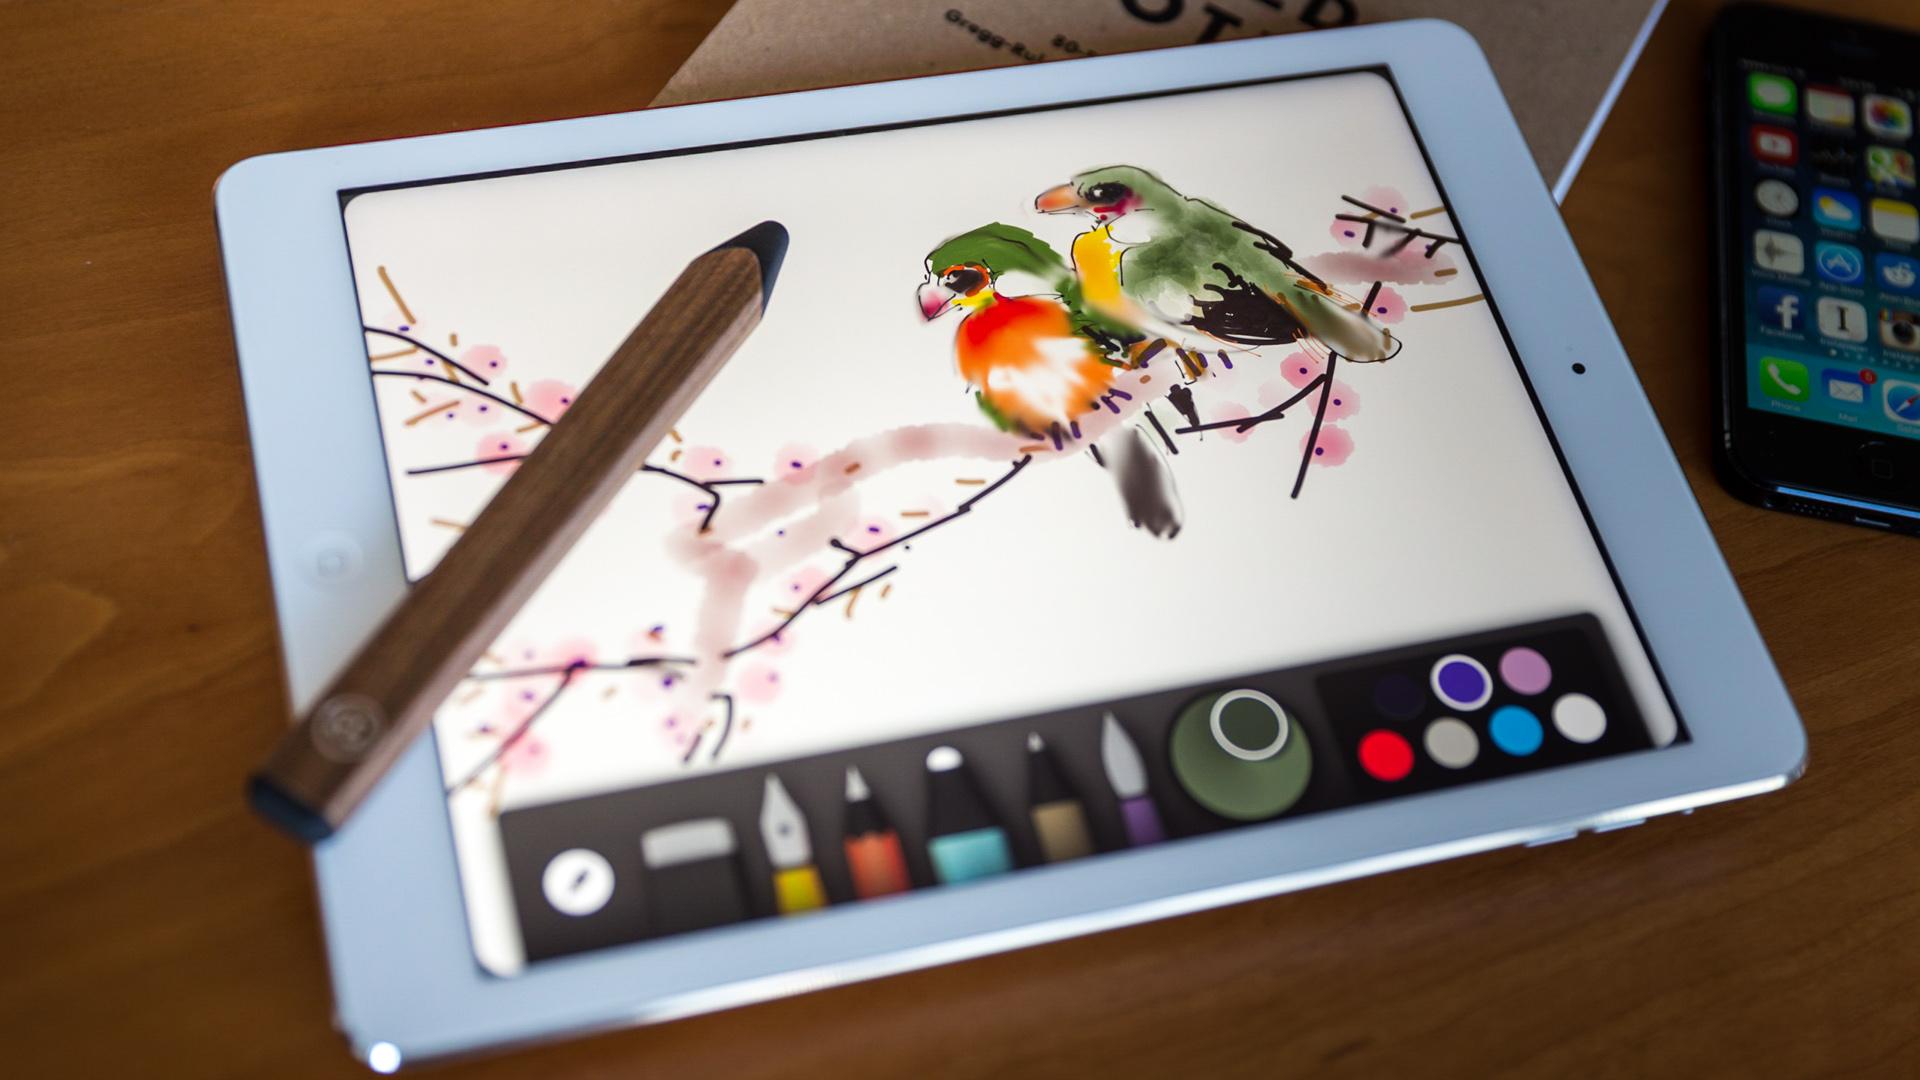 12-inch iPad Pro + Stylus Coming Q2 2015